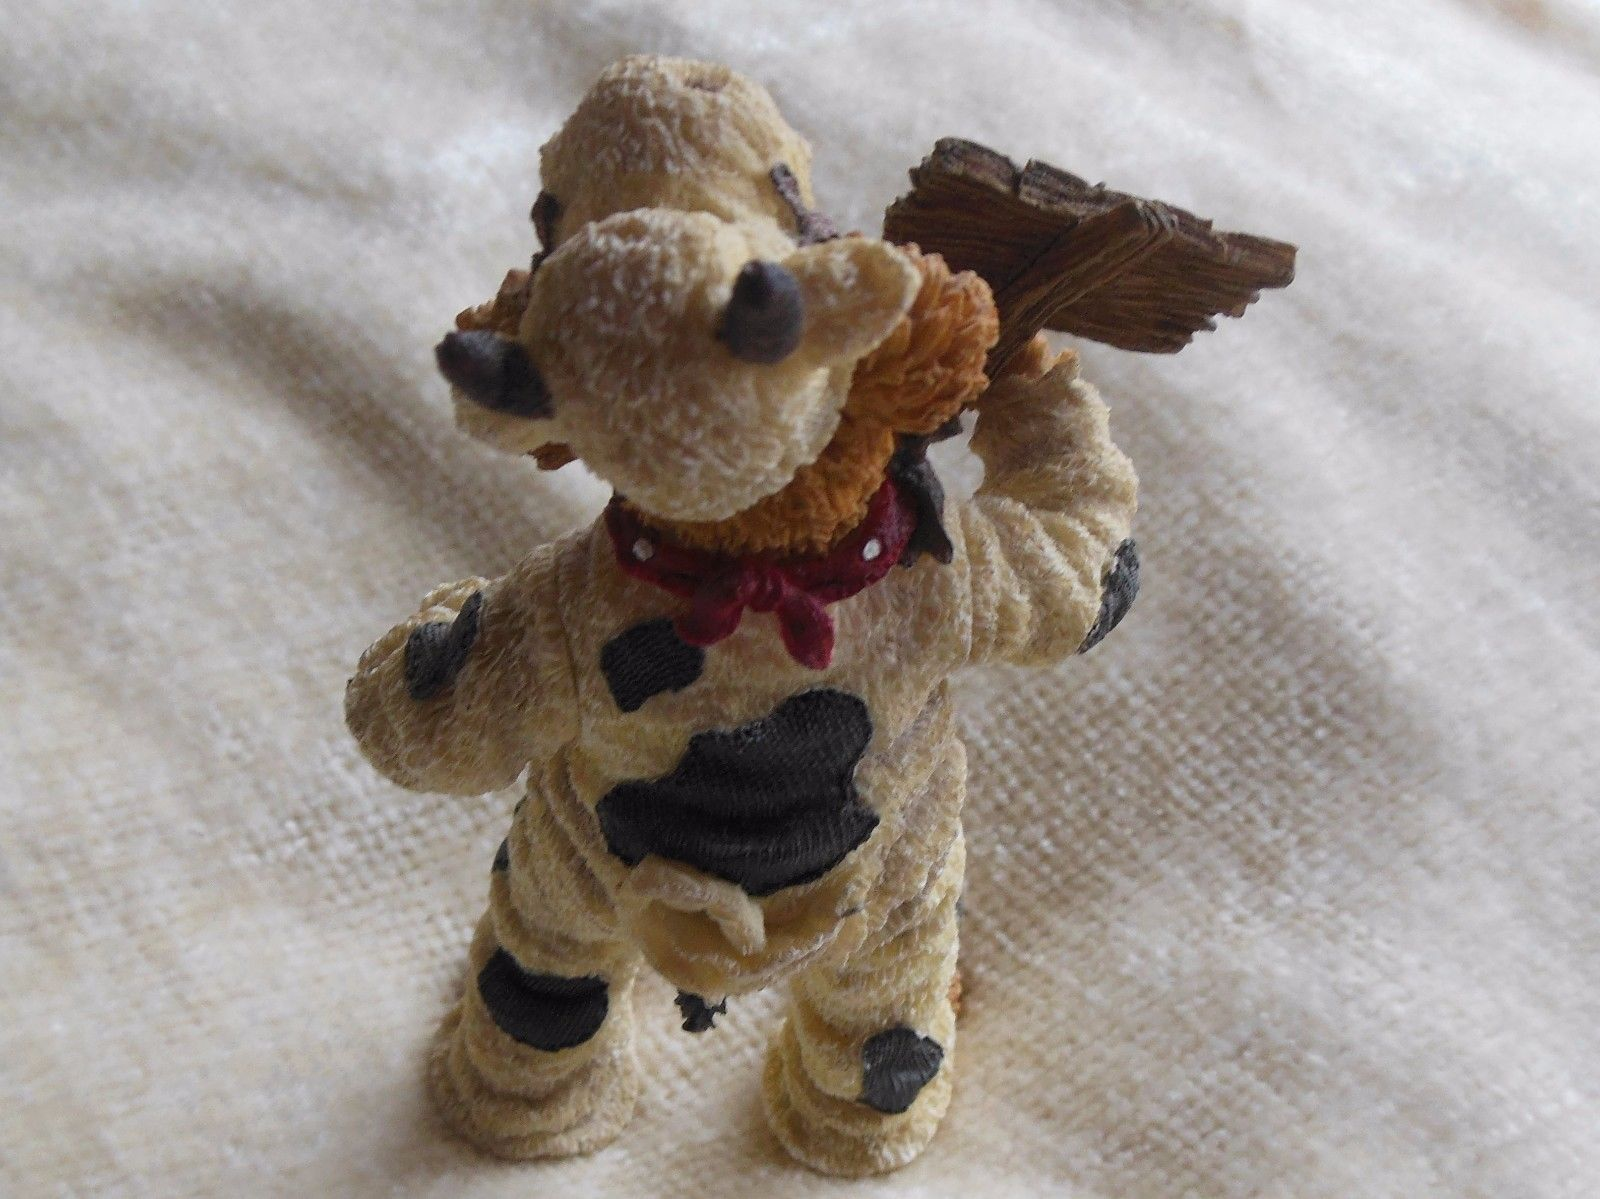 Boyd's Bears Angus Bearger...Quit Yer Béefin!-Boyds Shoe Box Bears #3230